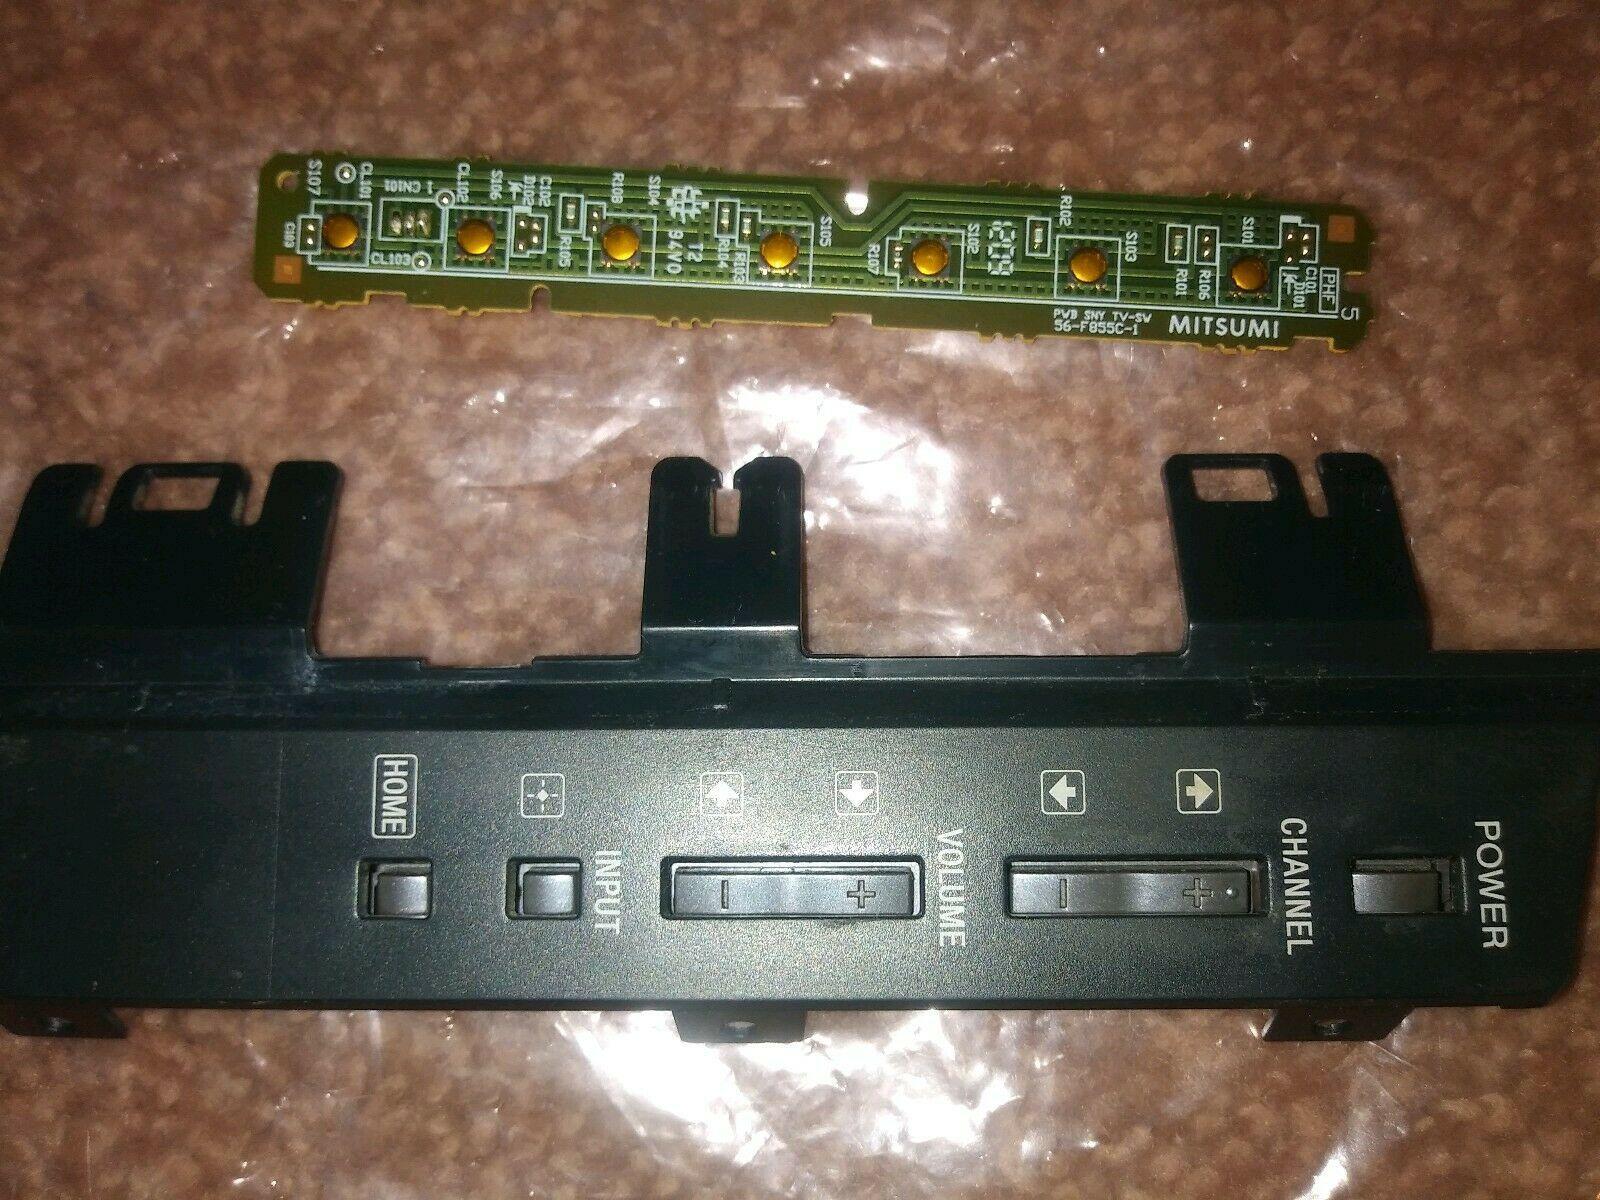 Sony 56-F855C-1 Function Control Board For Model KDL-52Z5100 - $5.00